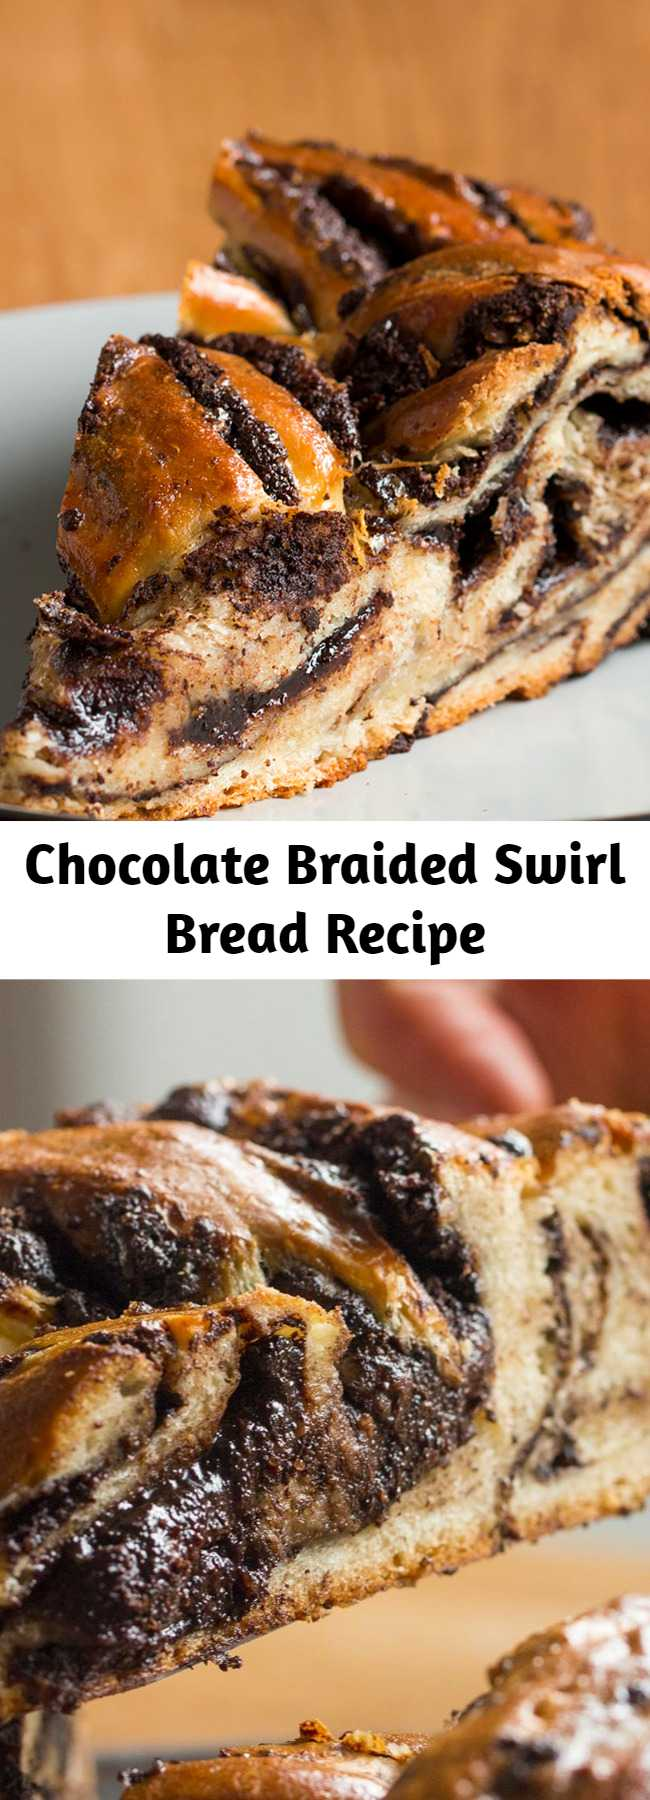 Chocolate Braided Swirl Bread Recipe (Babka)